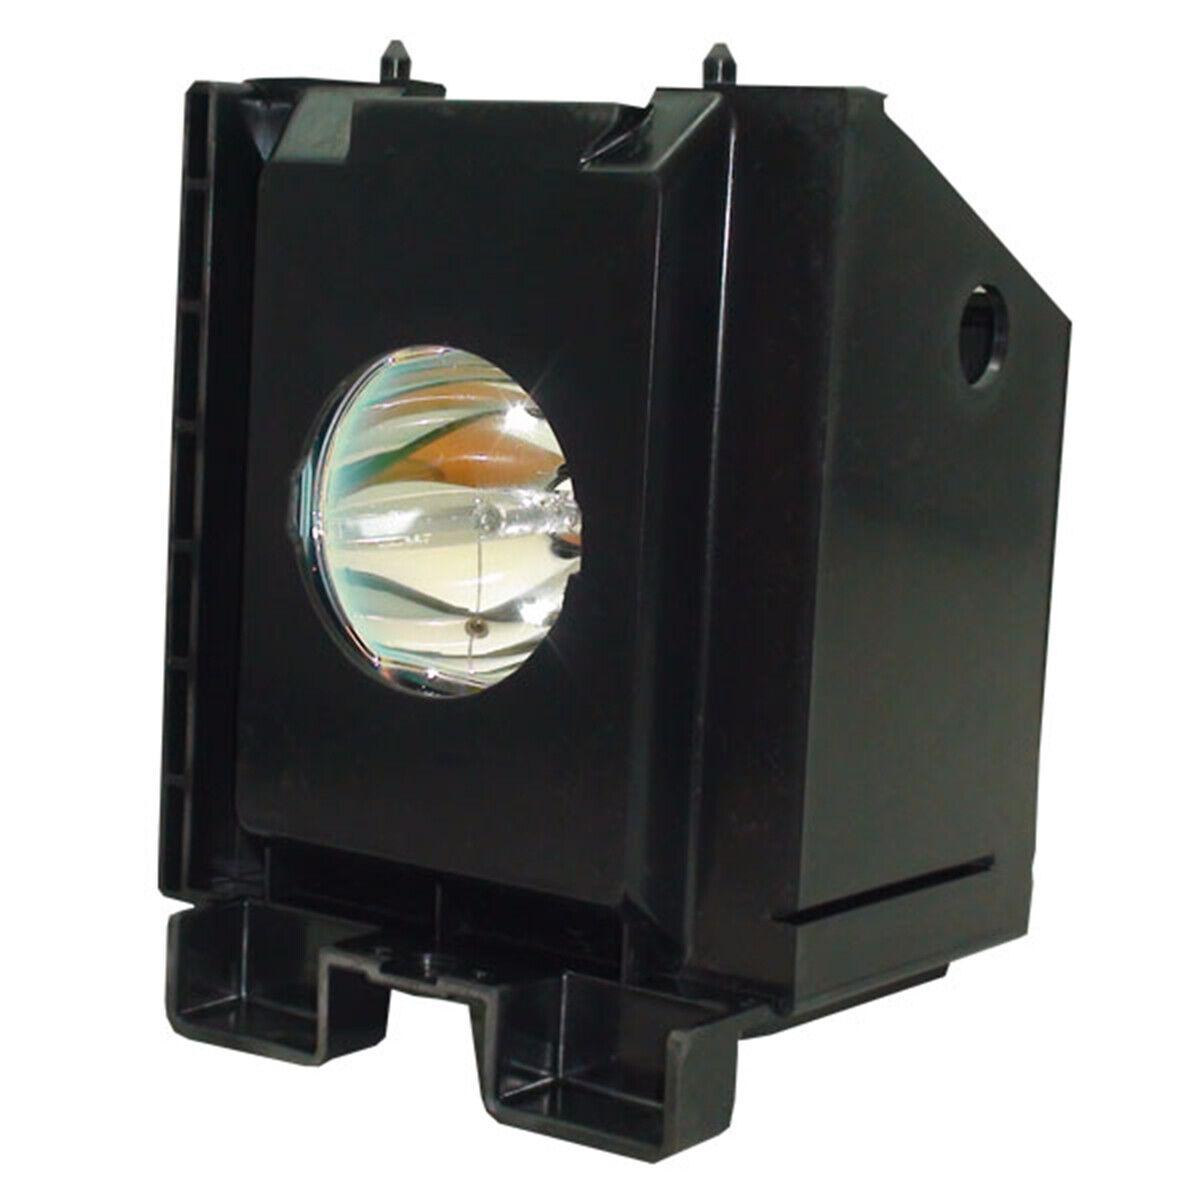 ORIGINAL SAMSUNG BP96-01099A BP9601099A LAMP IN HOUSING BRAND NEW!